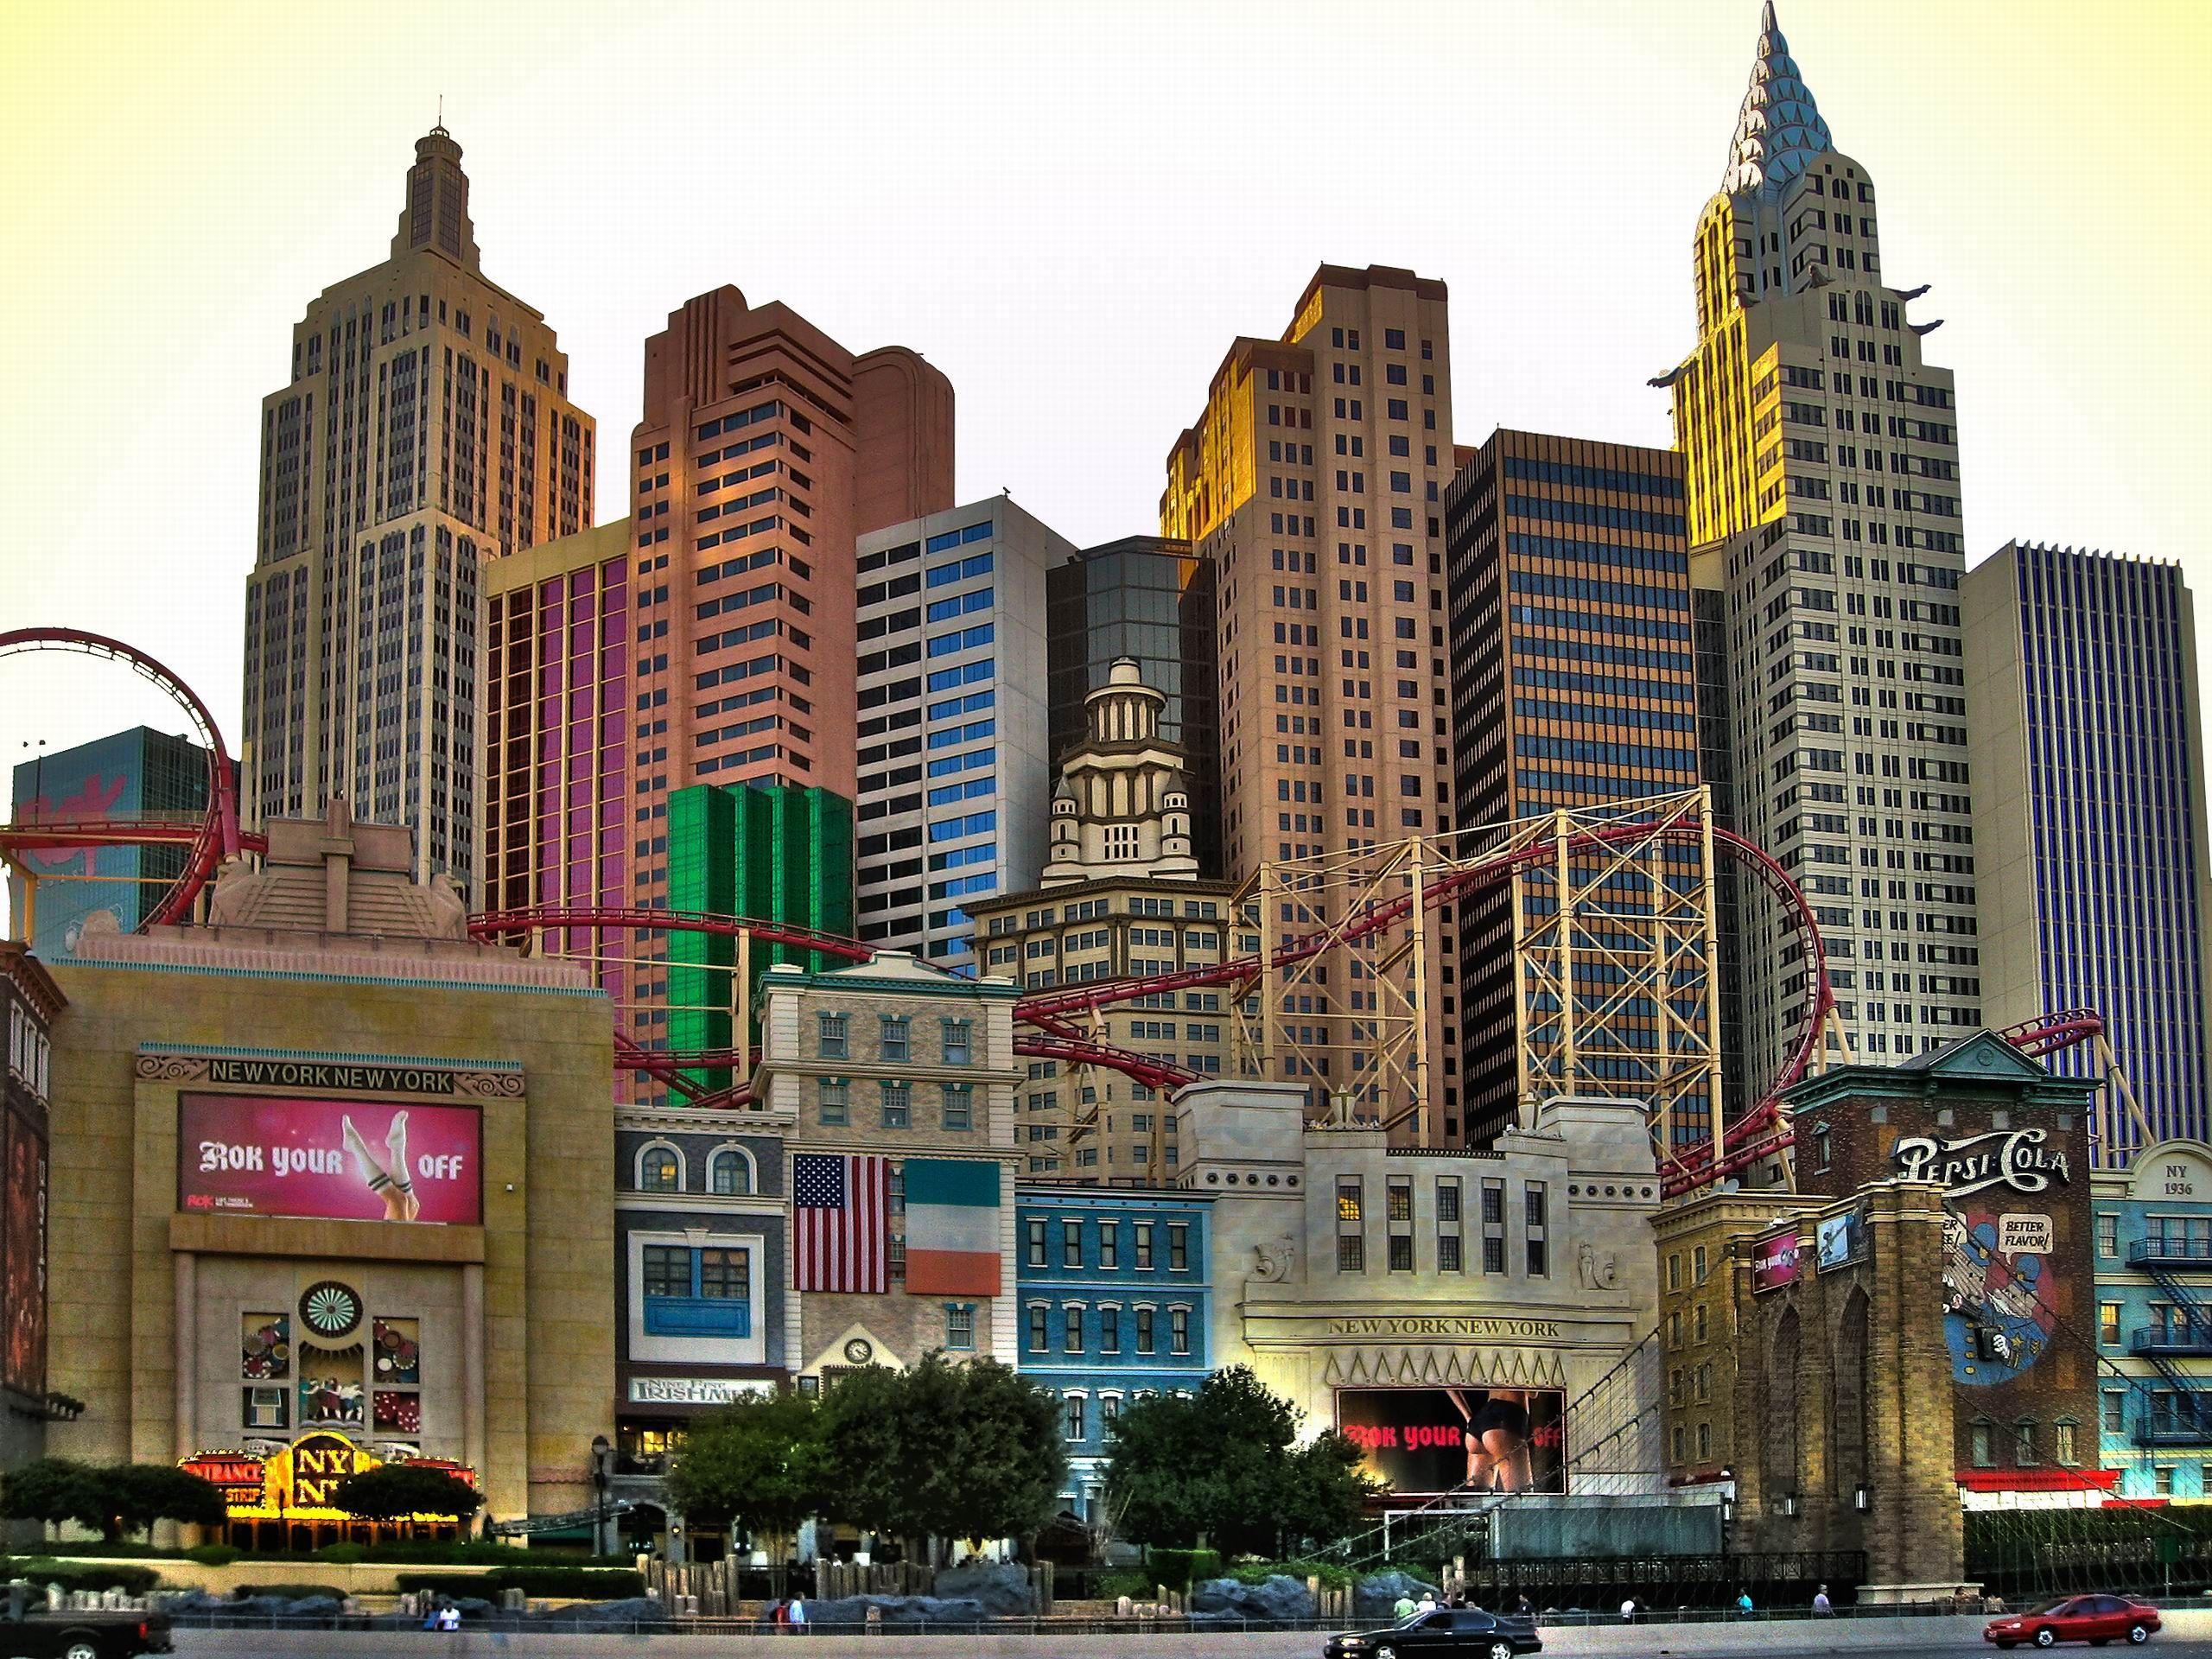 Fondo De Montañas Nevadas En Hd: Fondos De Pantalla Ciudades Nevadas Para Fondo De Pantalla